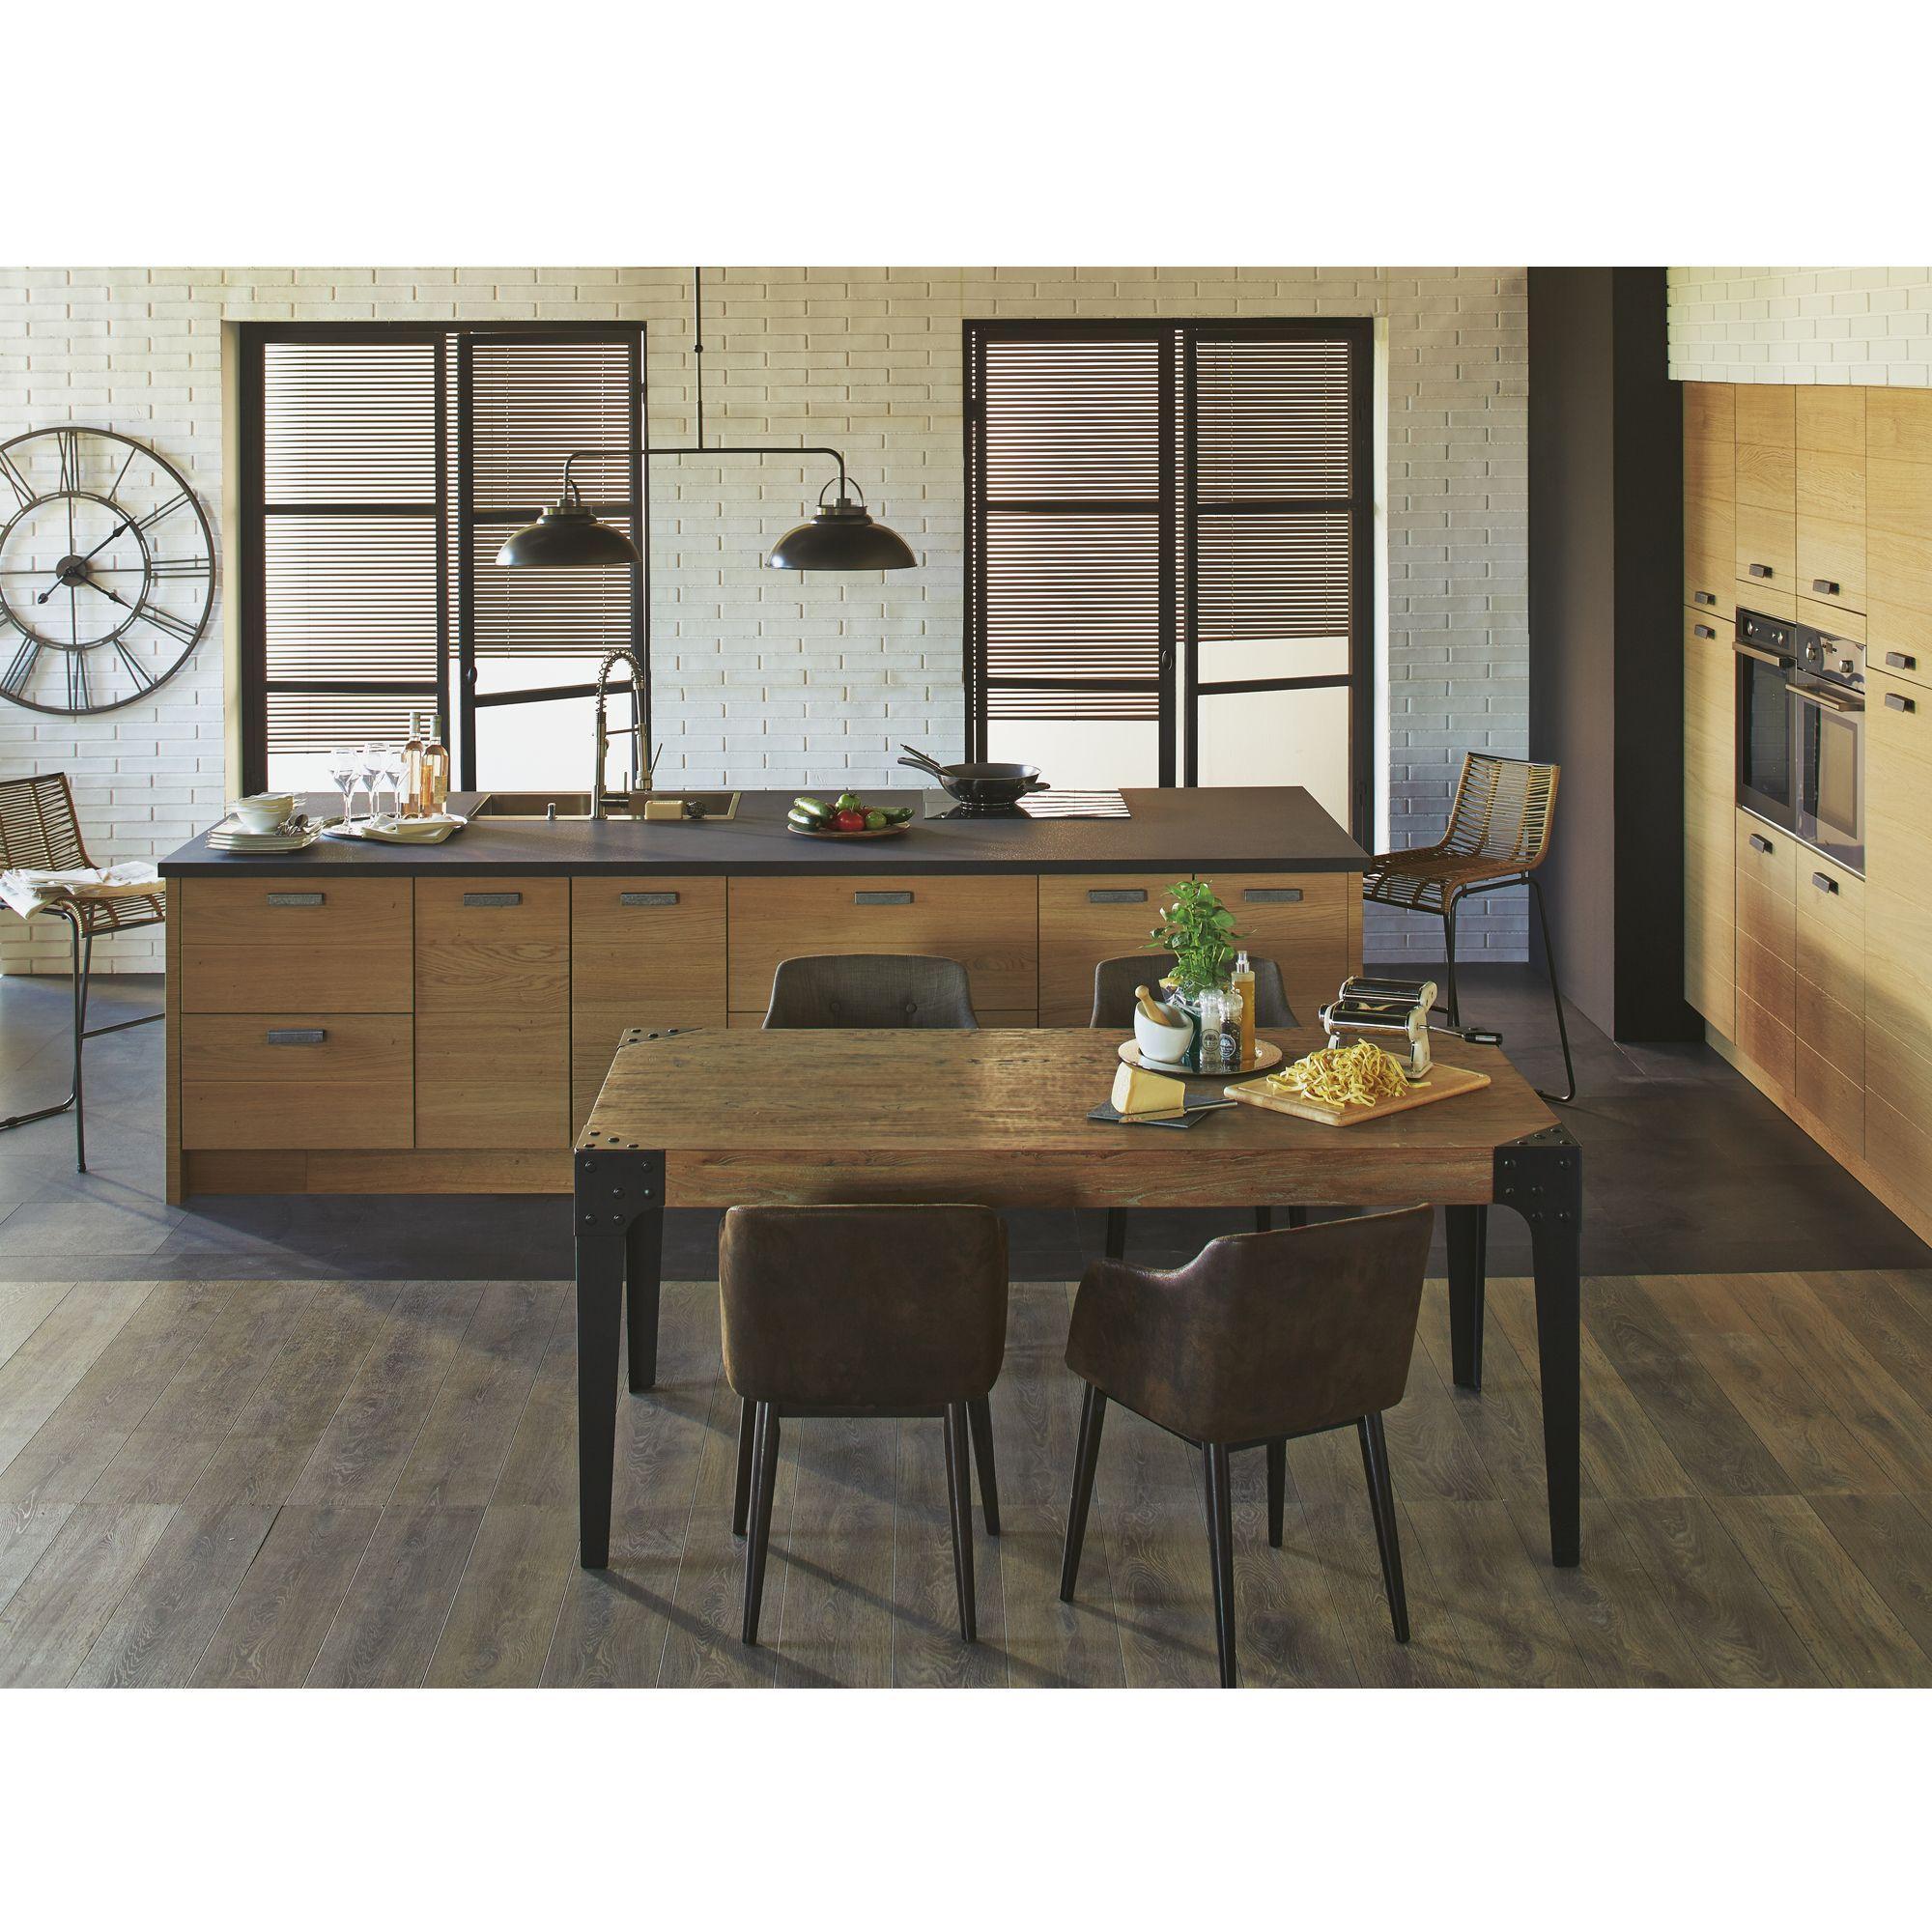 trendy cuisine composer modle type naturel origin les cuisines composer alina meubles de cuisine. Black Bedroom Furniture Sets. Home Design Ideas